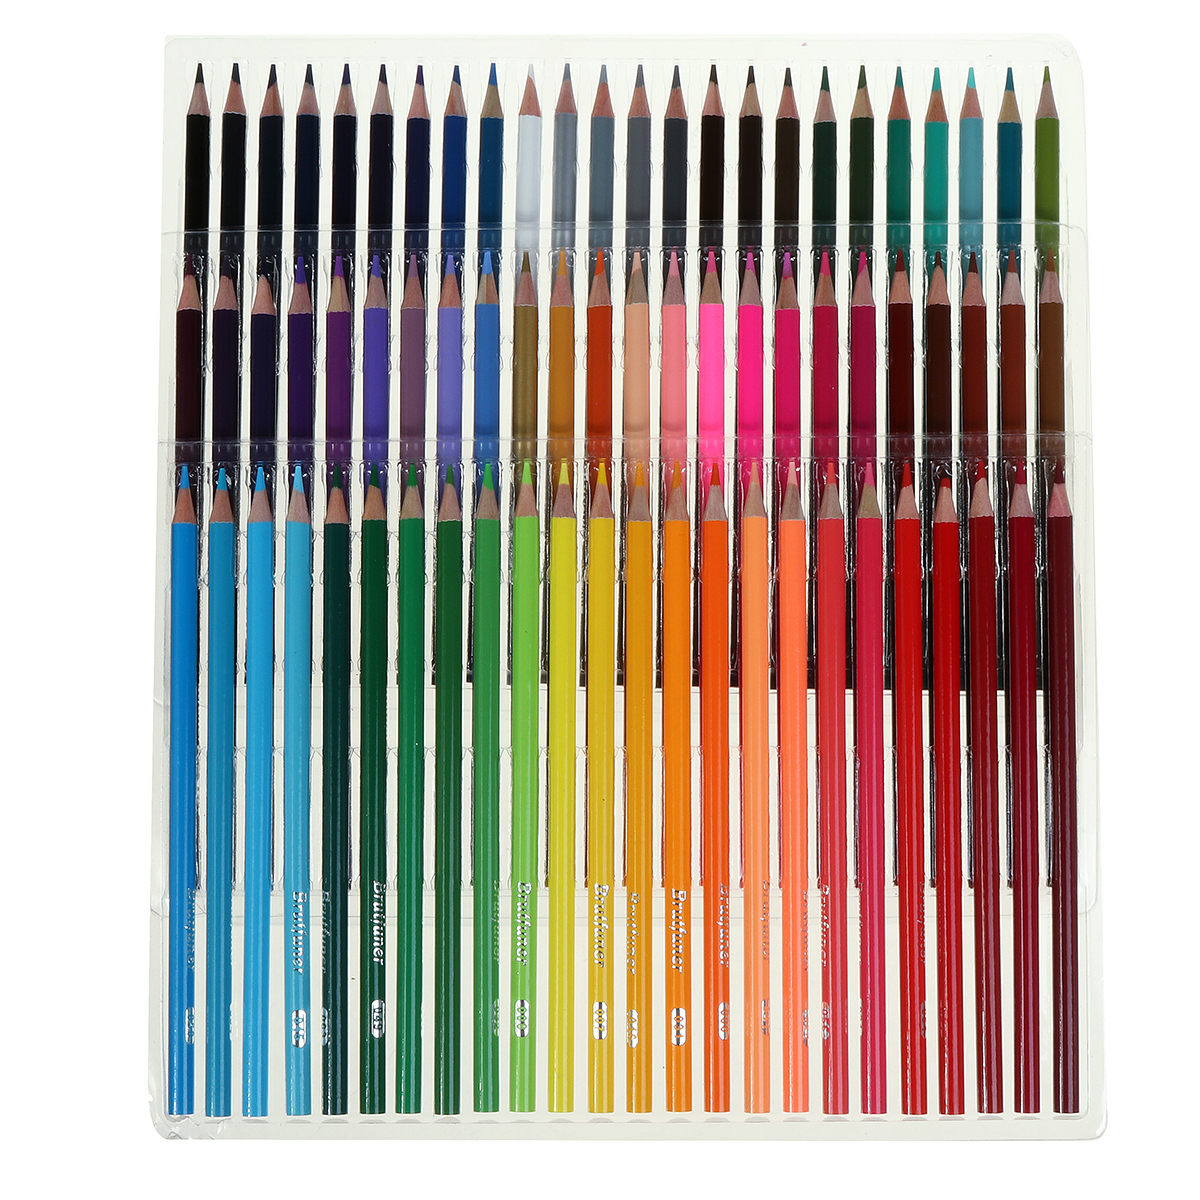 48/72/120/160 Colors Professional Colored Pencils Set Artist Oil Painting Sketching Wood Color Pencil School Art Supplies